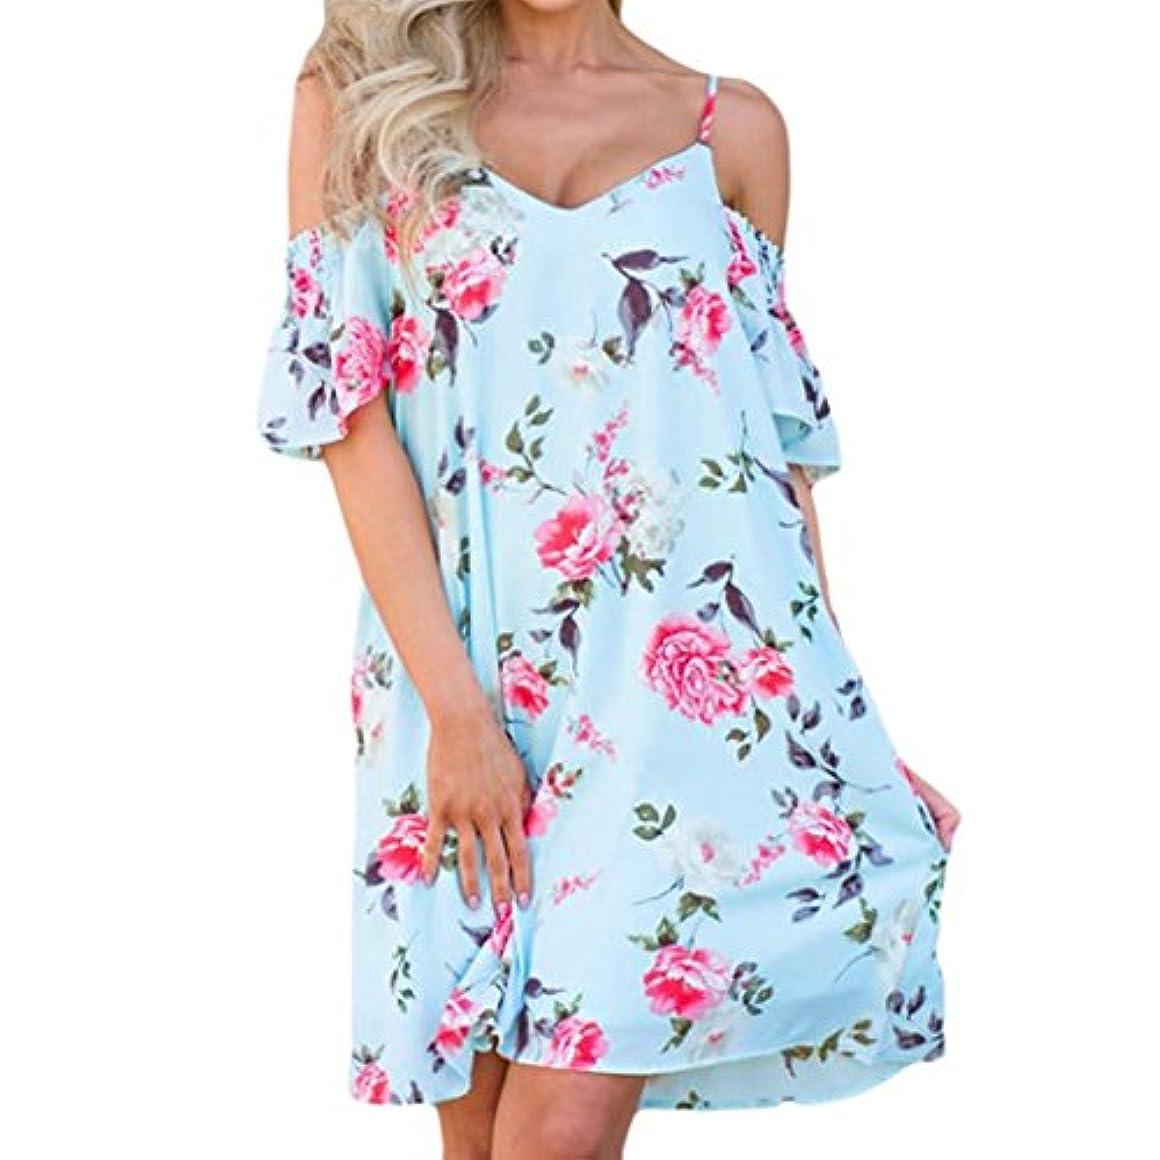 症状不利益SakuraBest Women's Summer Print Spaghetti Strap Flounce Loose Swing Midi Dress (M, Blue)